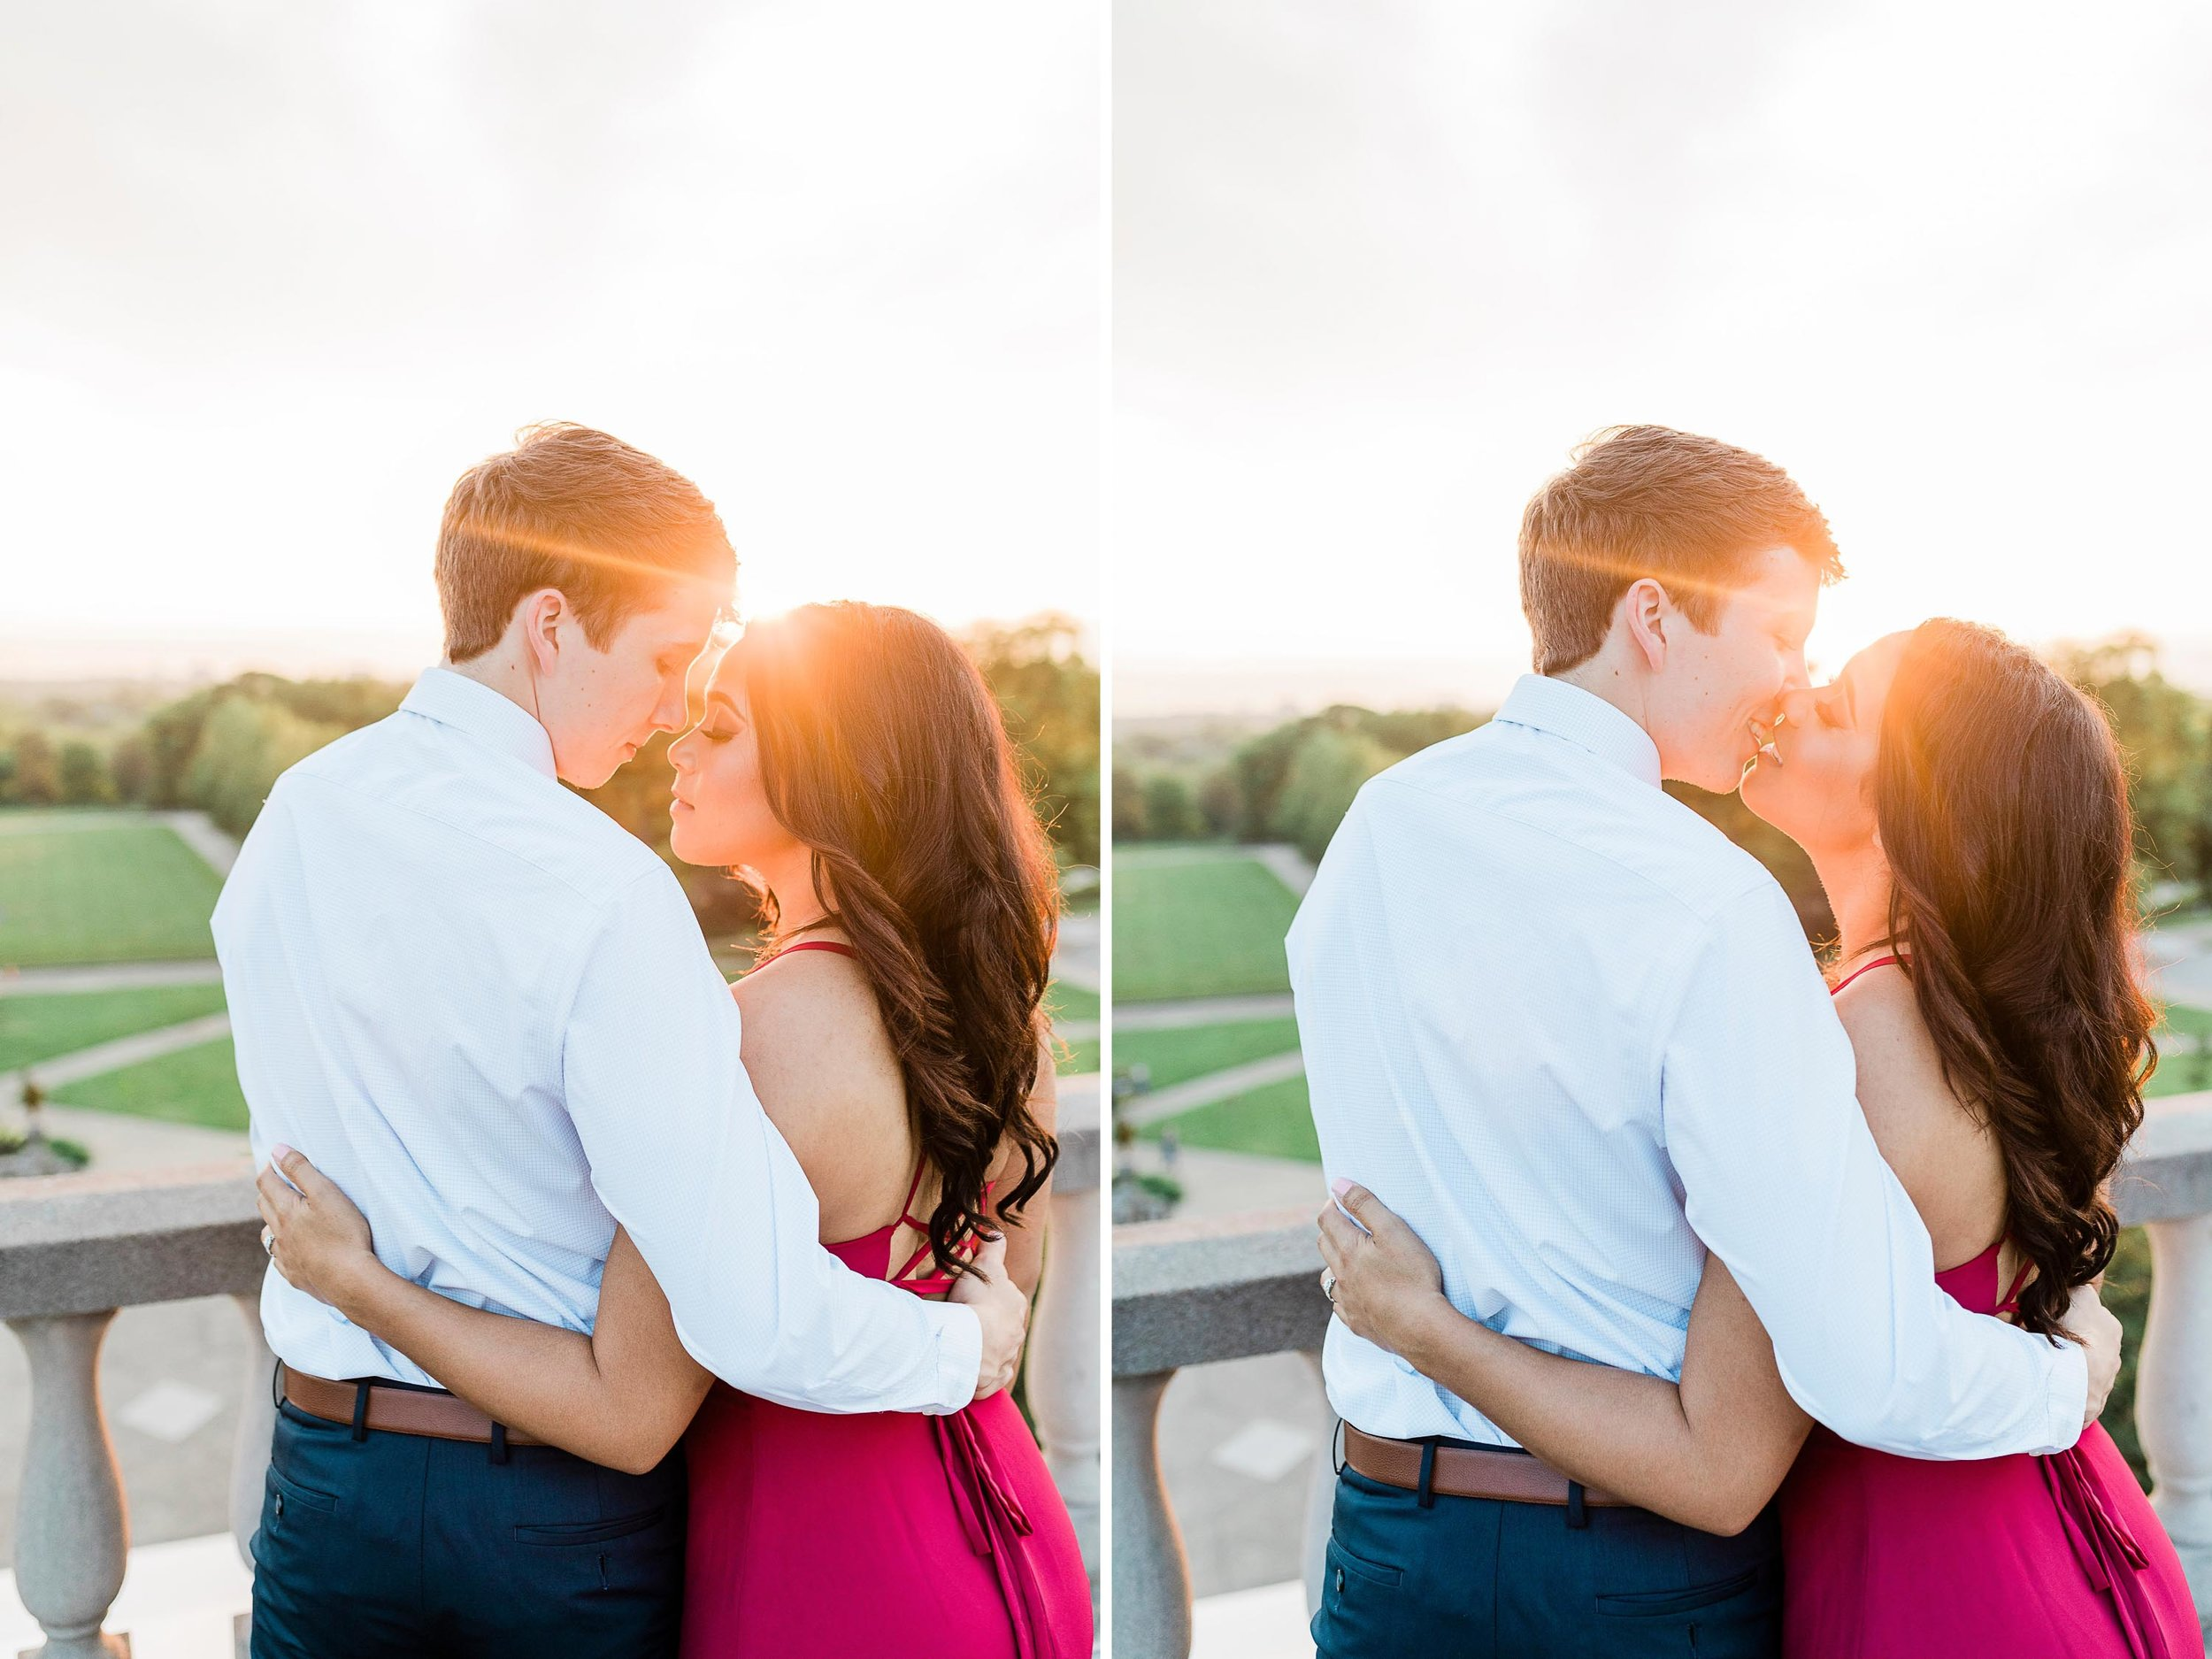 engagement photographers in cincinnati ohio.jpg